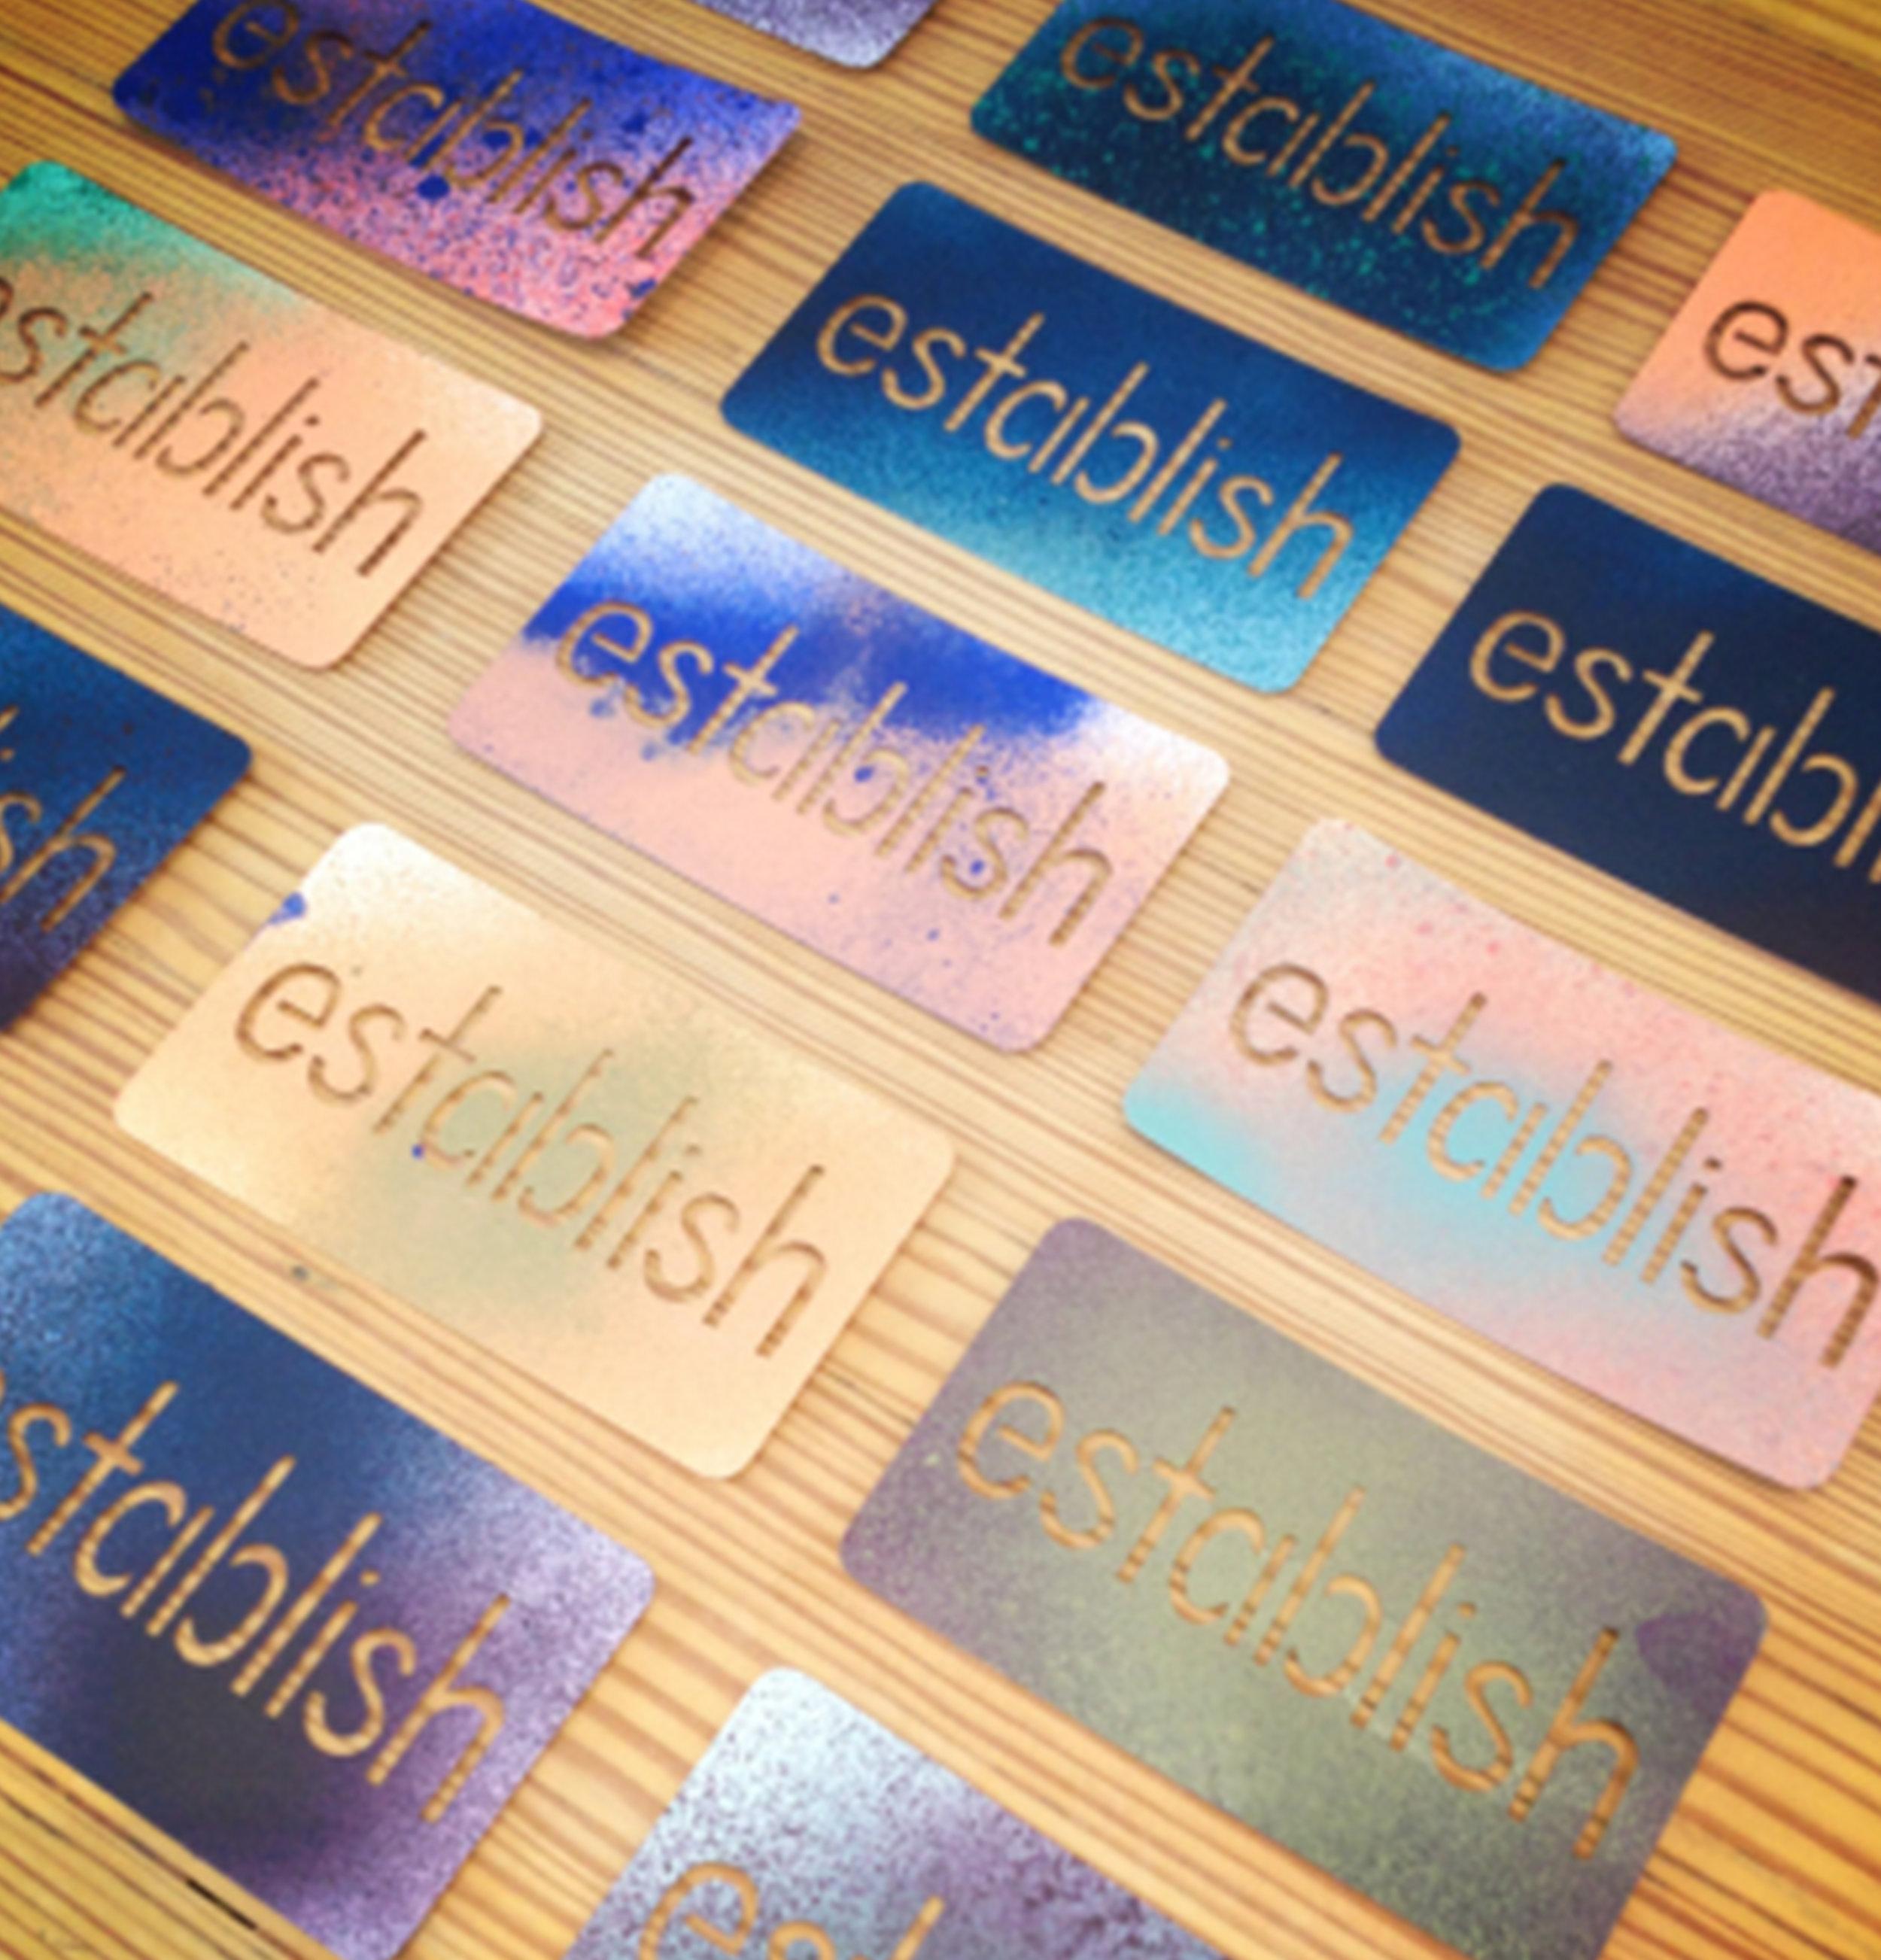 est_cards.jpg